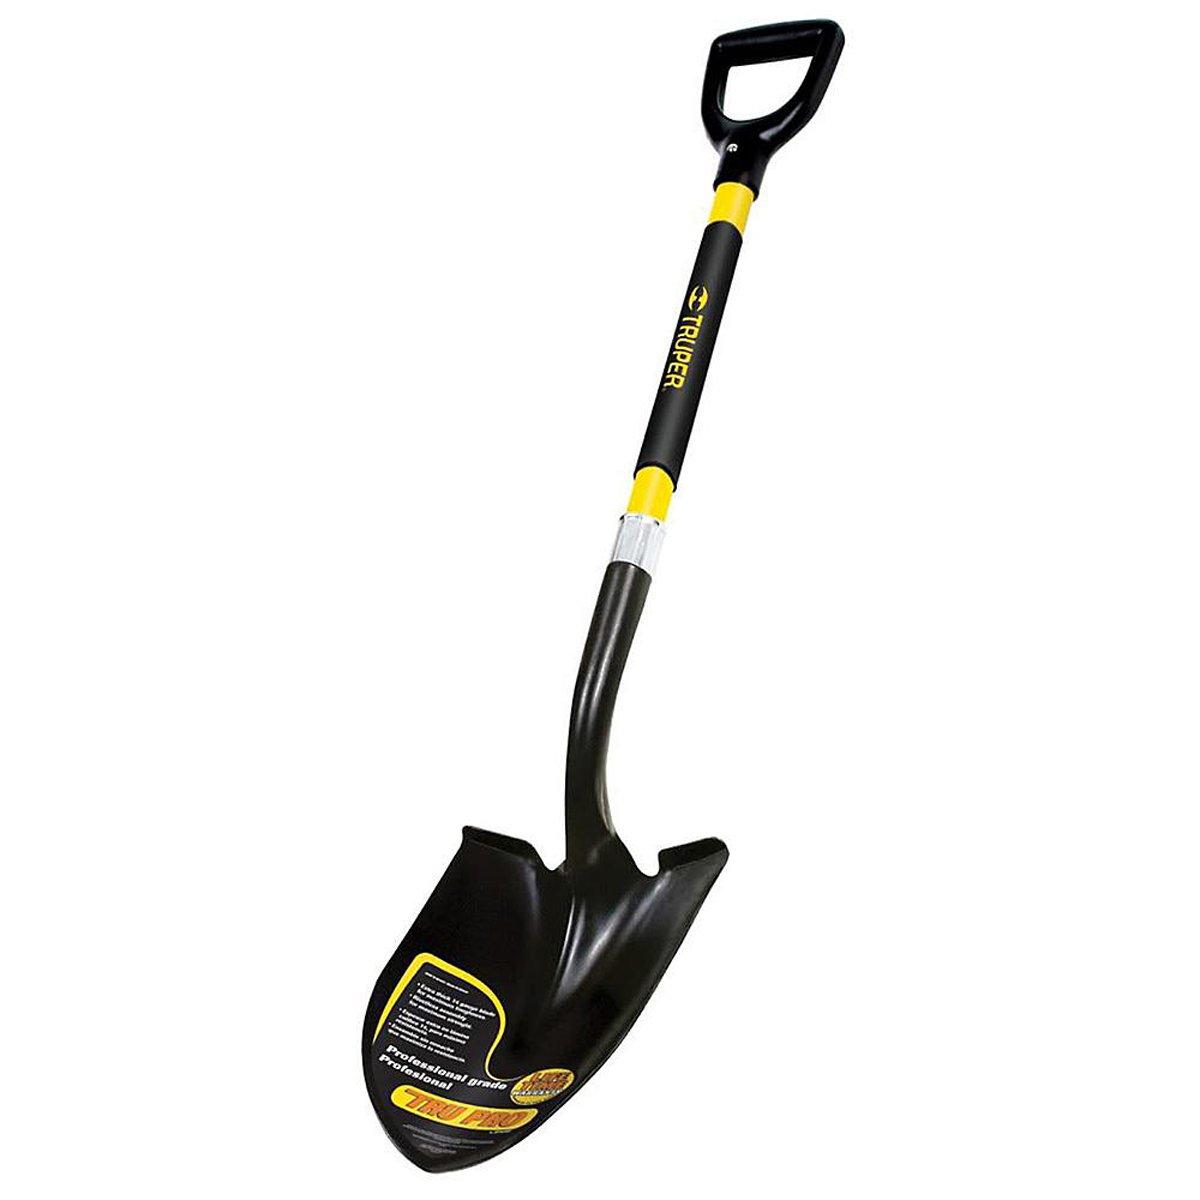 The Simple Fiberglass D-Shaped Handle of Truper Round Point Shovel